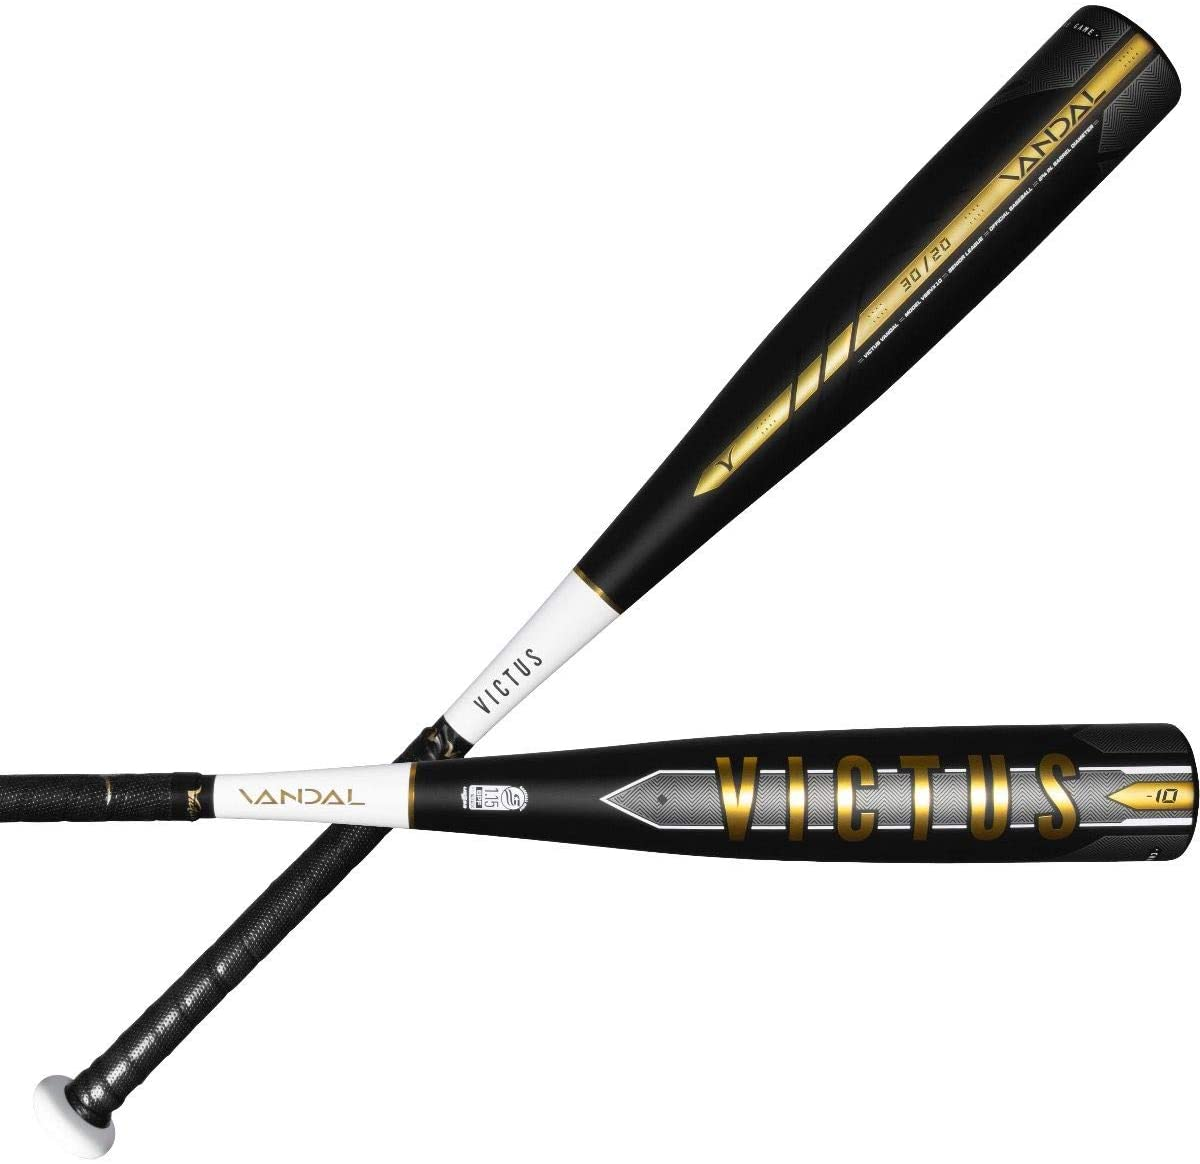 victus-vandal-10-baseball-bat-29-inch-19-oz VSBVX10-2919   <ul class=a-unordered-list a-vertical a-spacing-mini> <li><span class=a-list-item>Consistency and craftsmanship</span></li> <li><span class=a-list-item>Commitment to